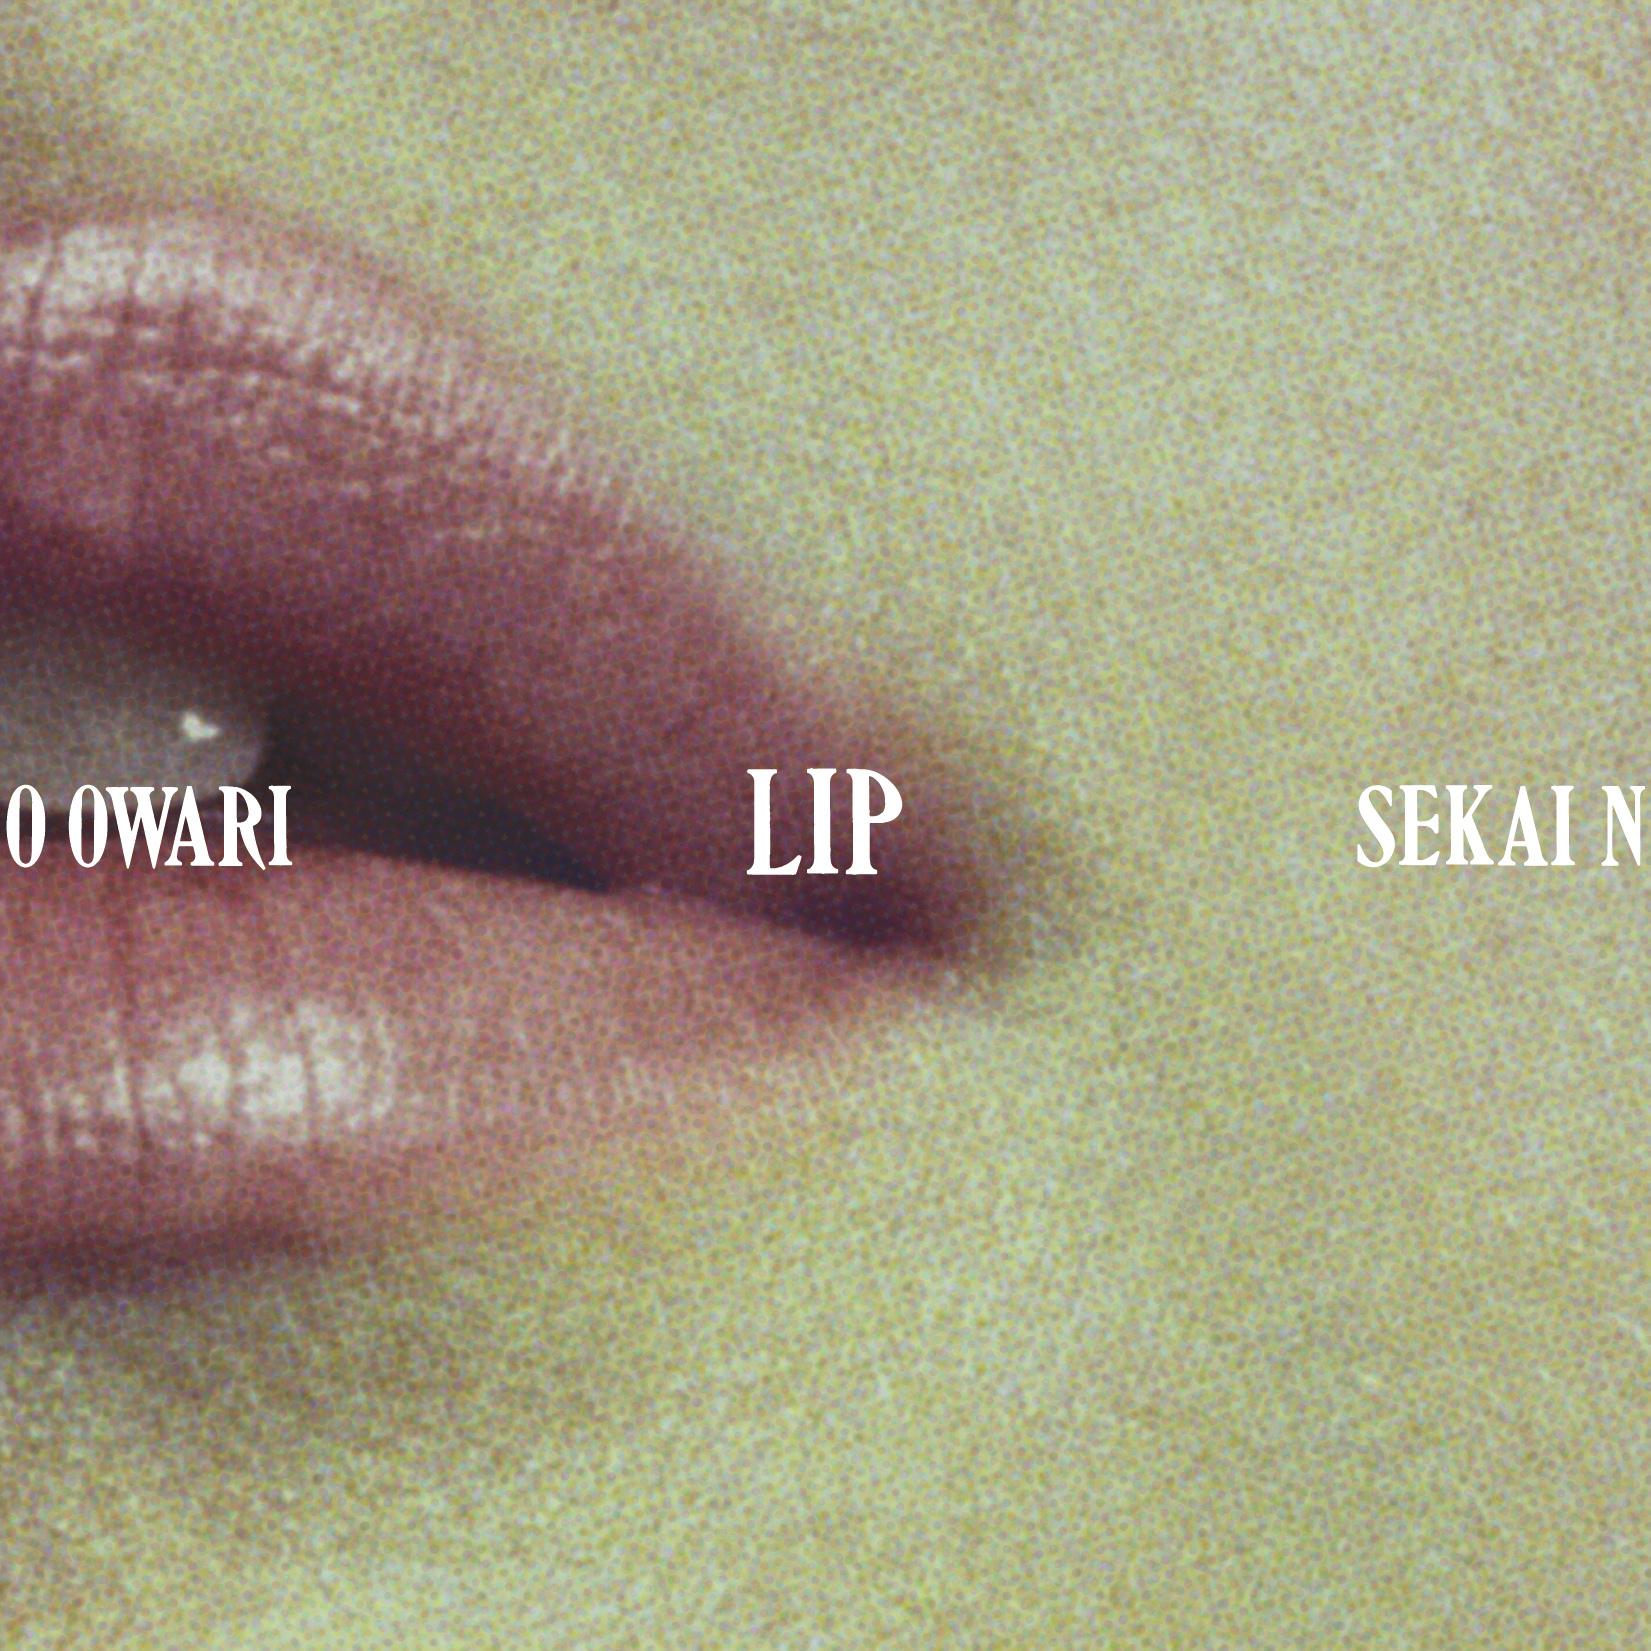 『Lip』